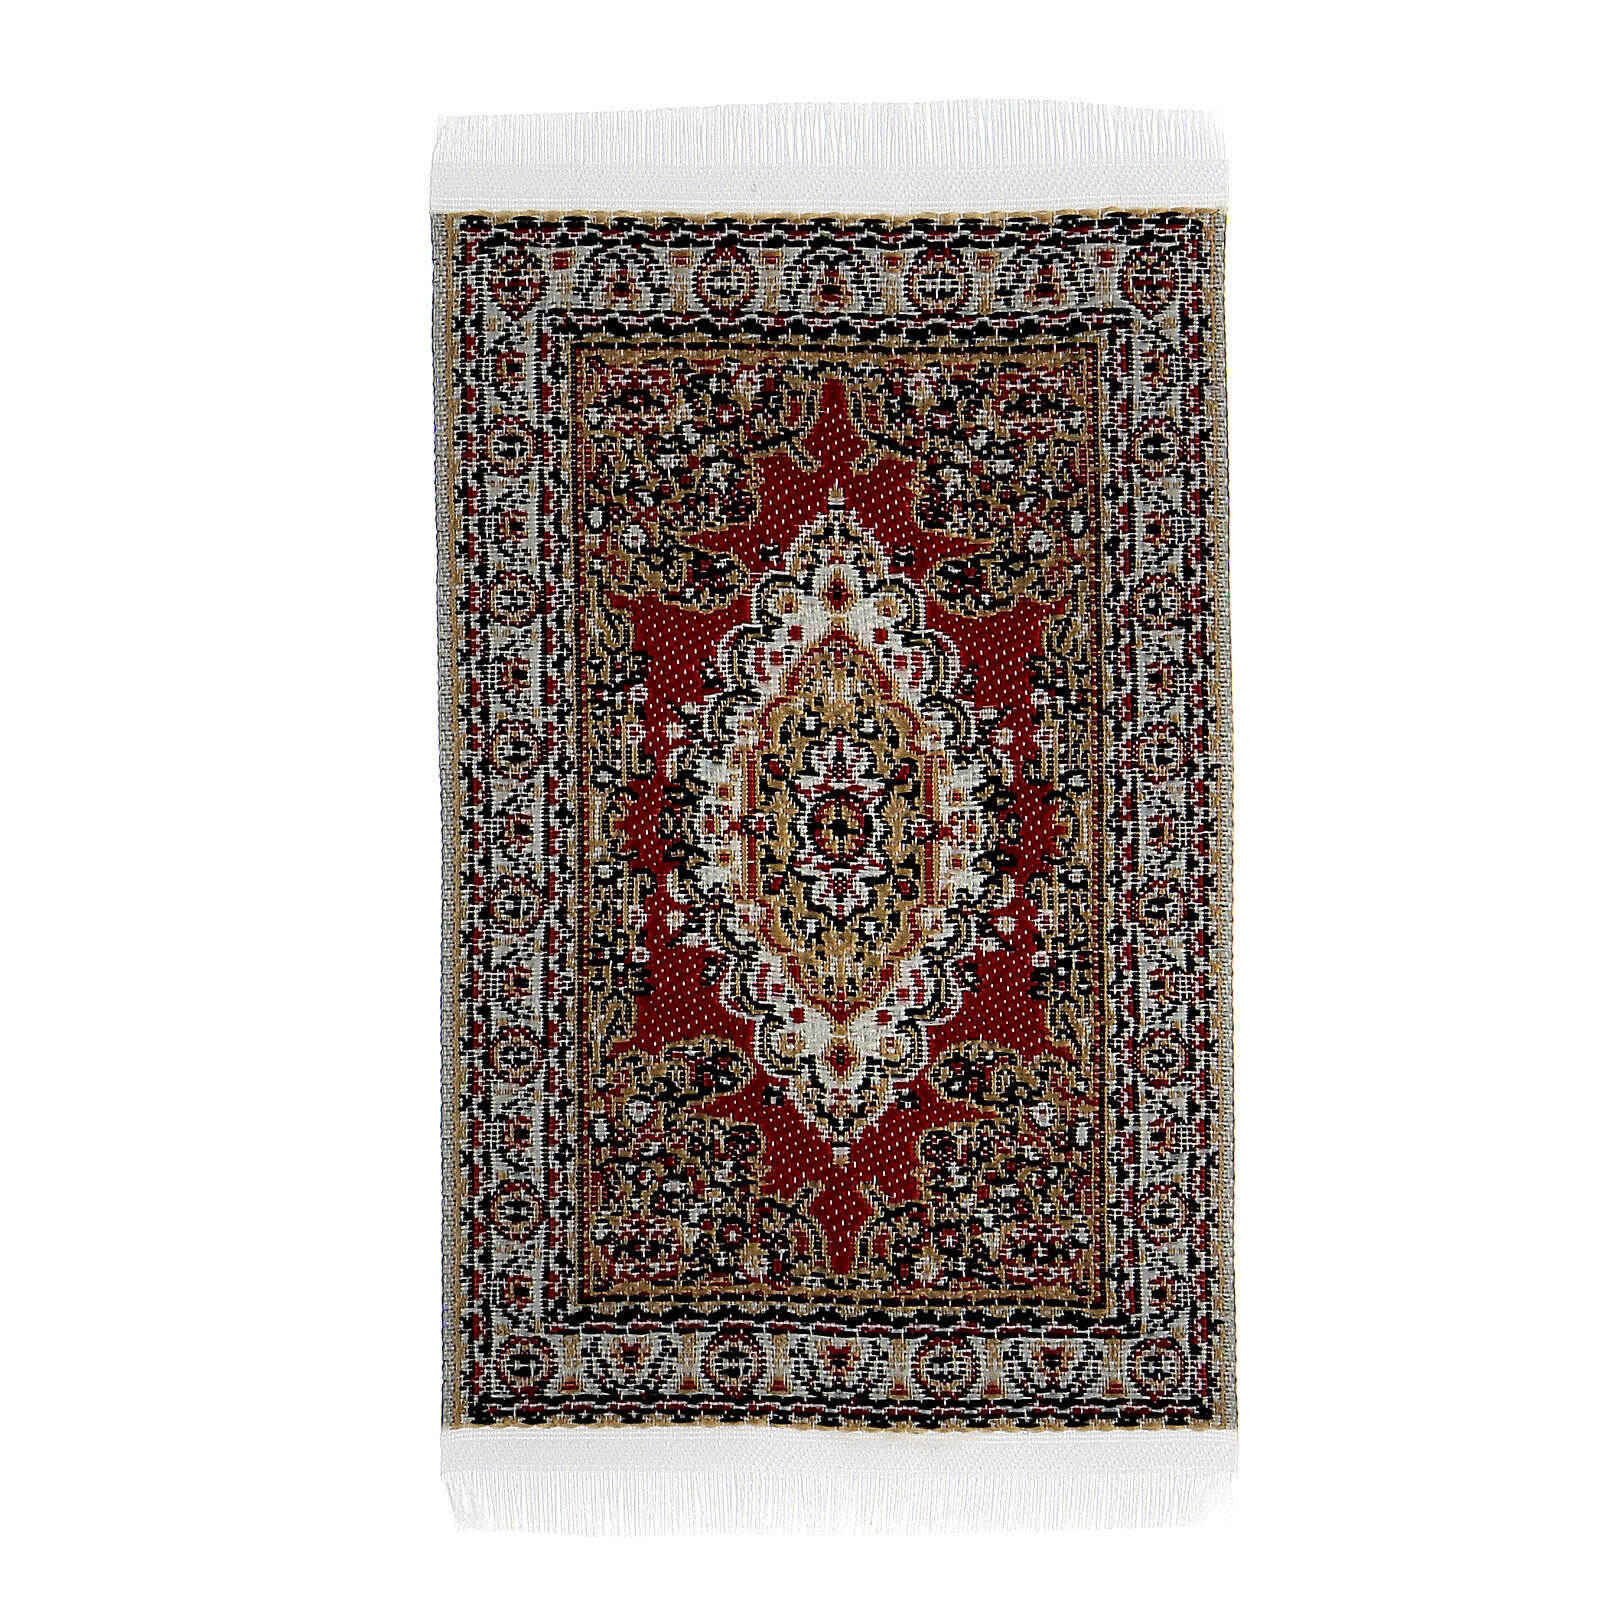 Carpet with various decorations 8x5 cm for Nativity scene 10-16 cm 4